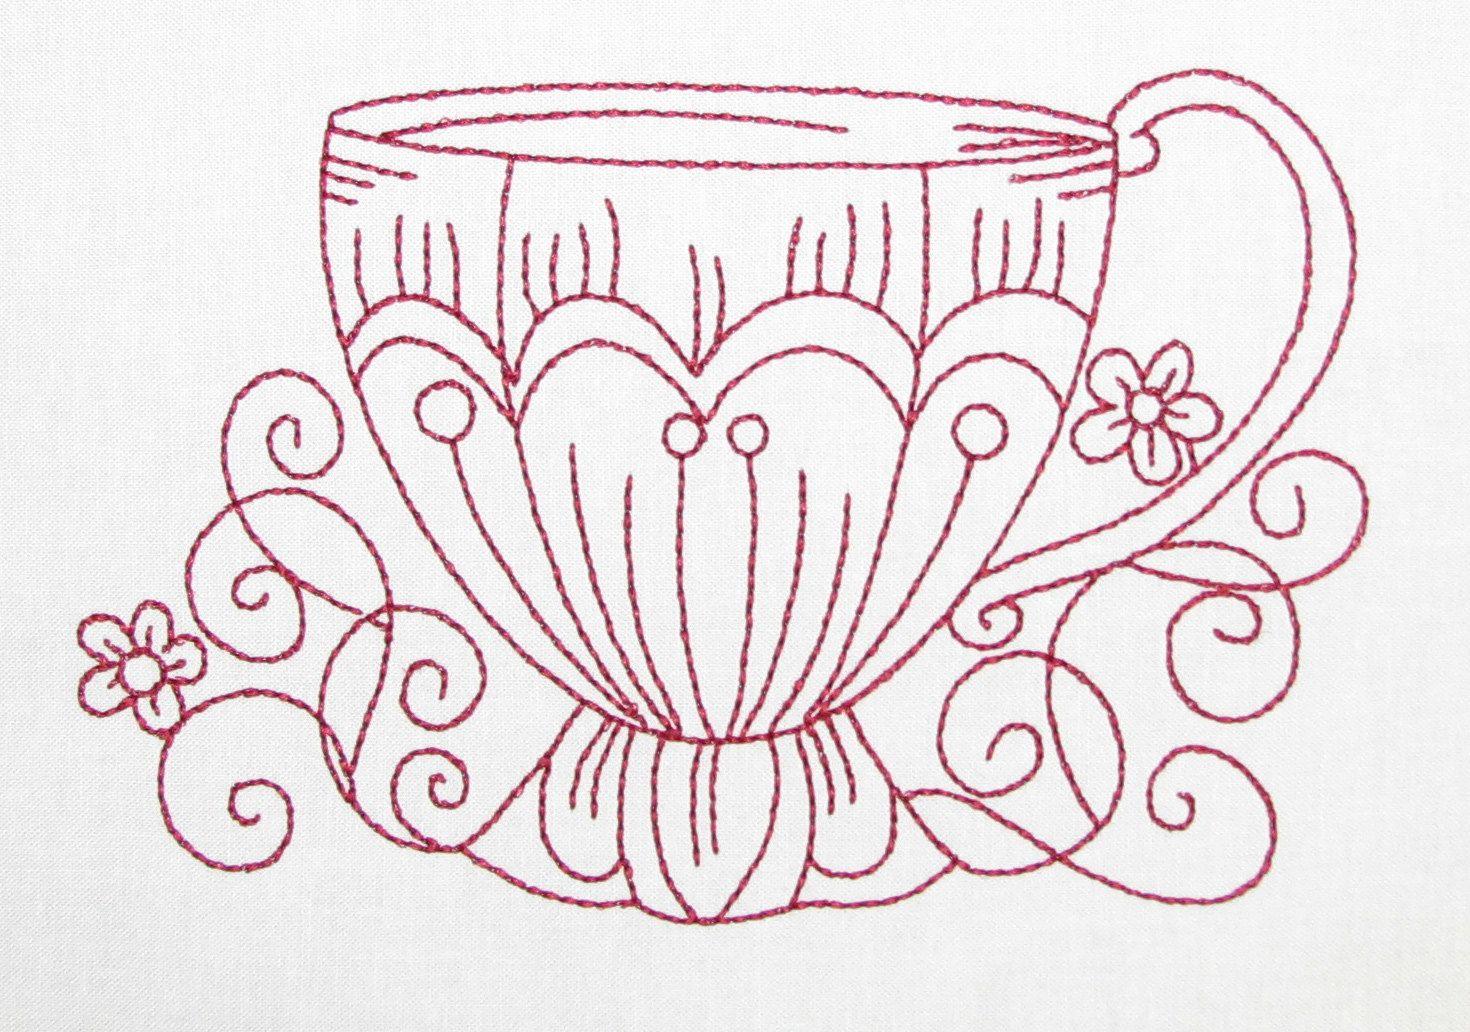 Redwork Teacups Machine Embroidery Patterns - 4x4 Hoop - 6 Designs ...